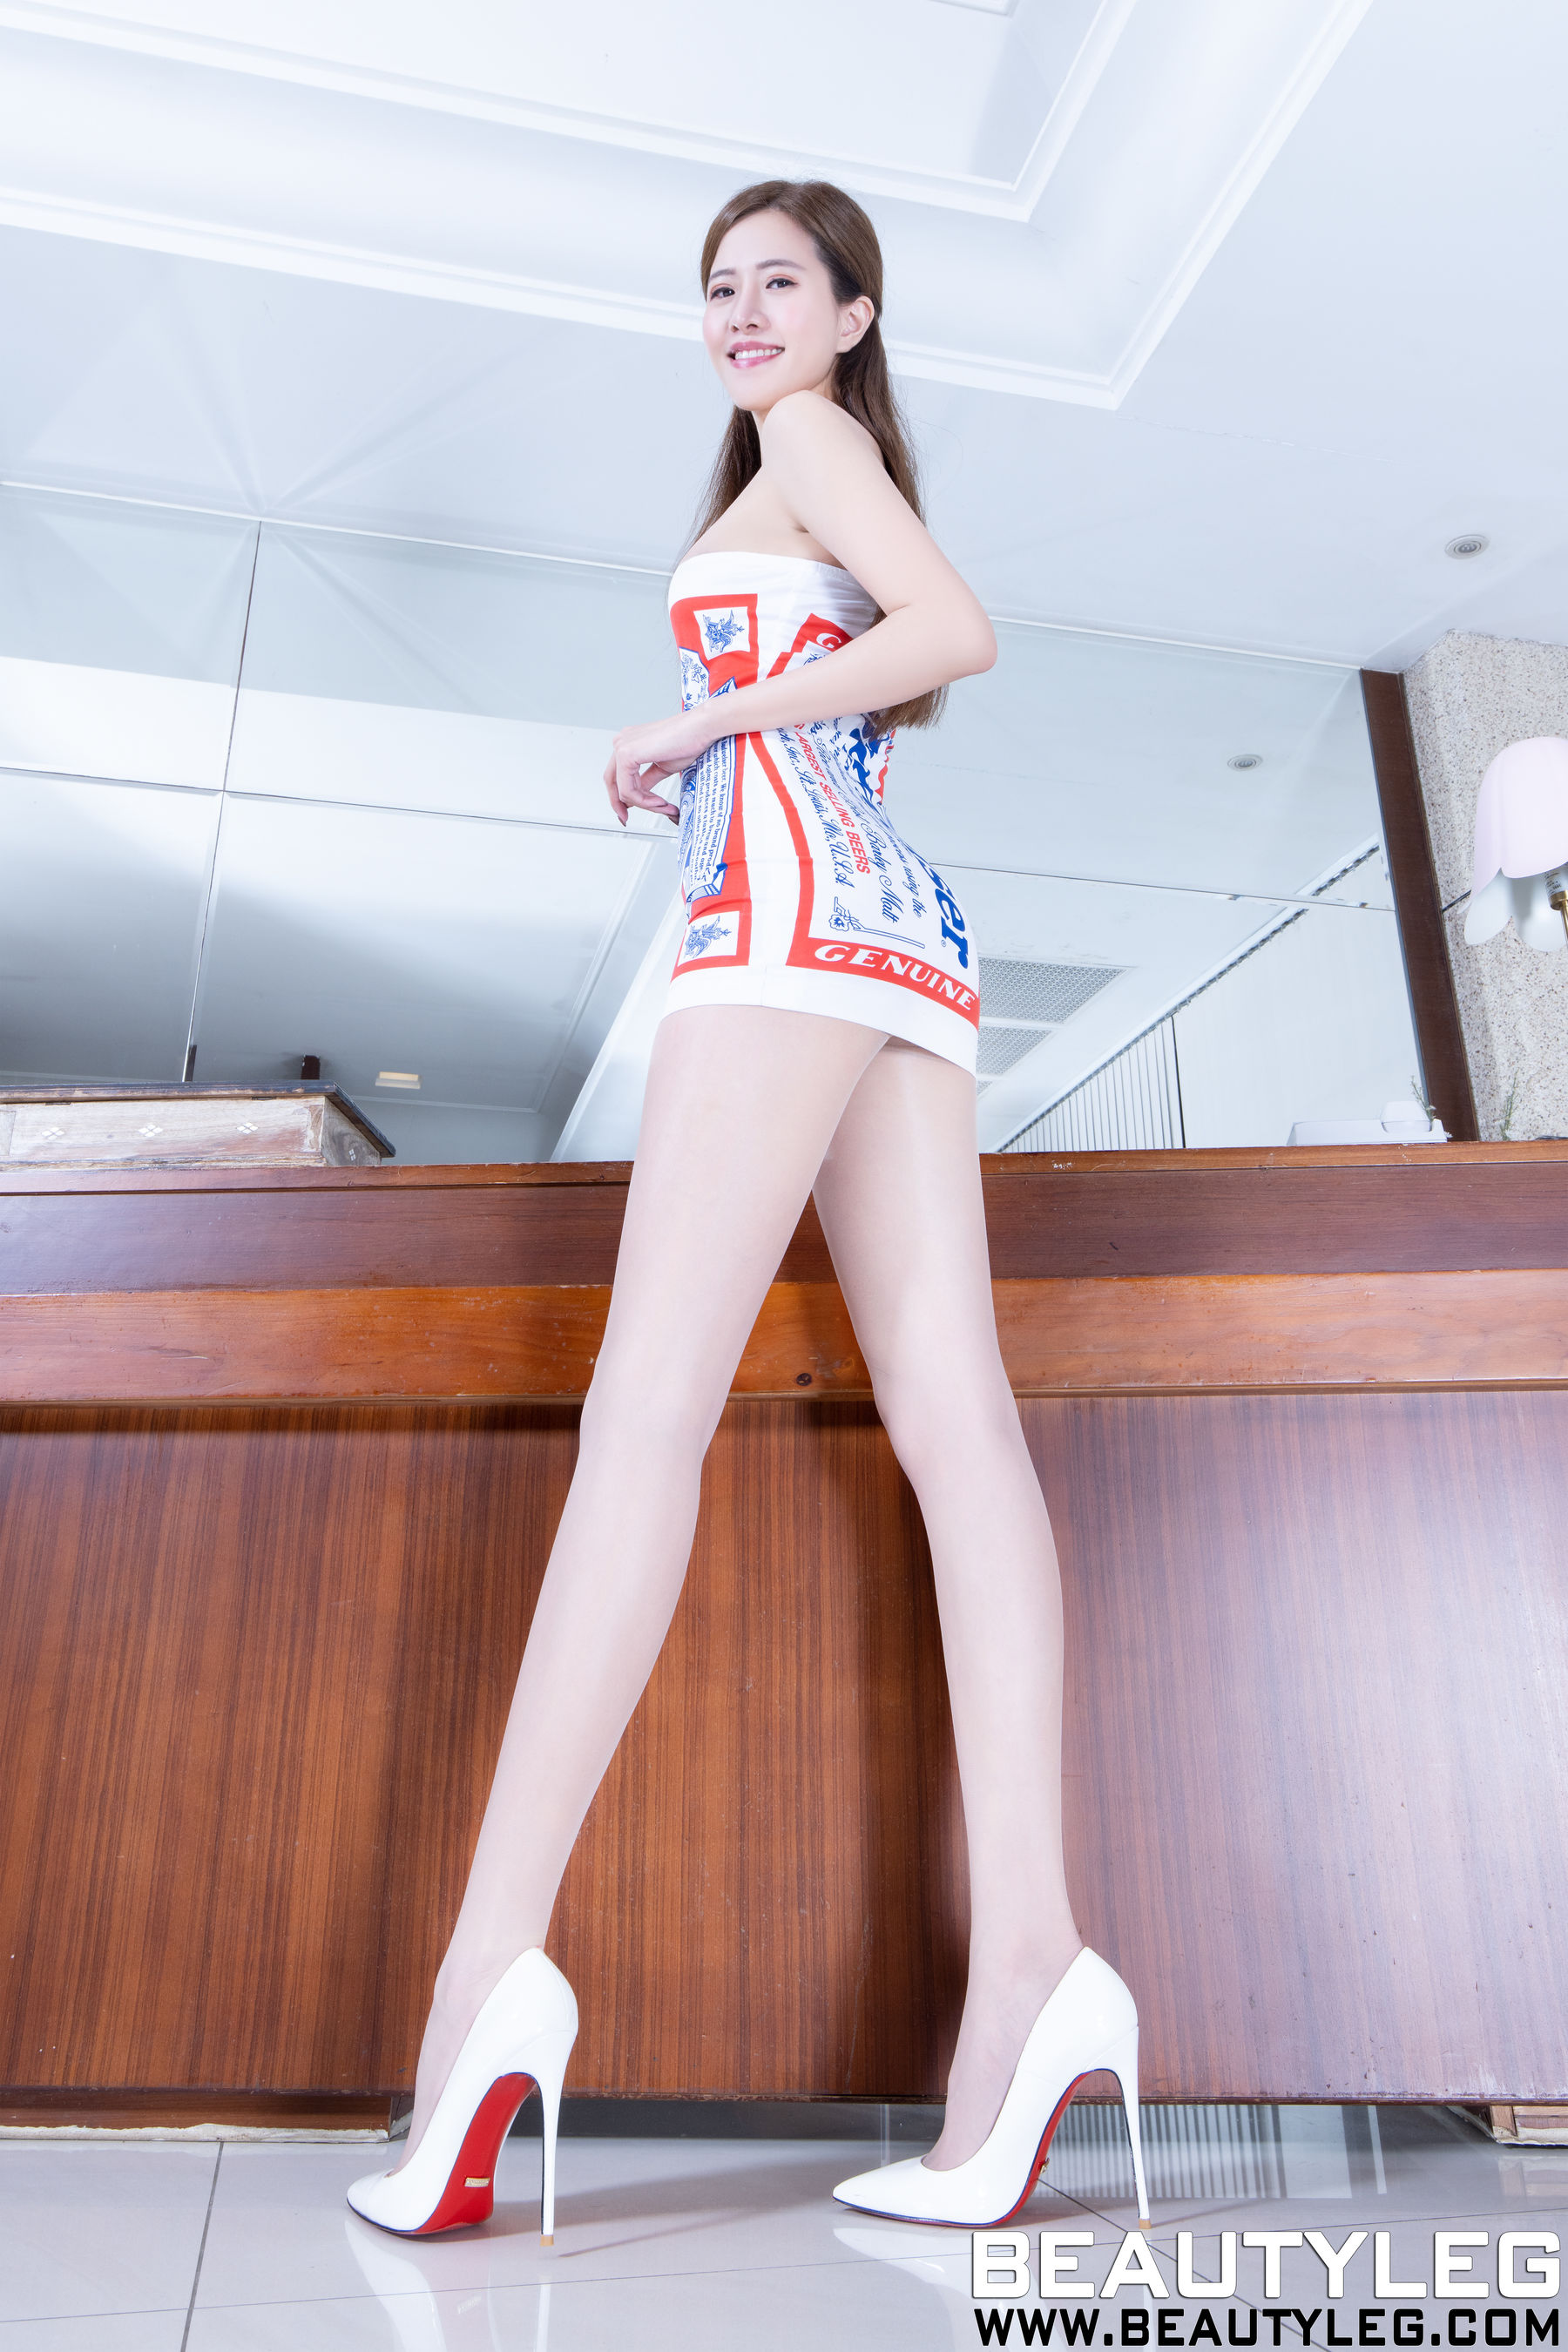 VOL.1329 [Beautyleg]高跟美腿:张欣慈(腿模Olivia)超高清个人性感漂亮大图(53P)